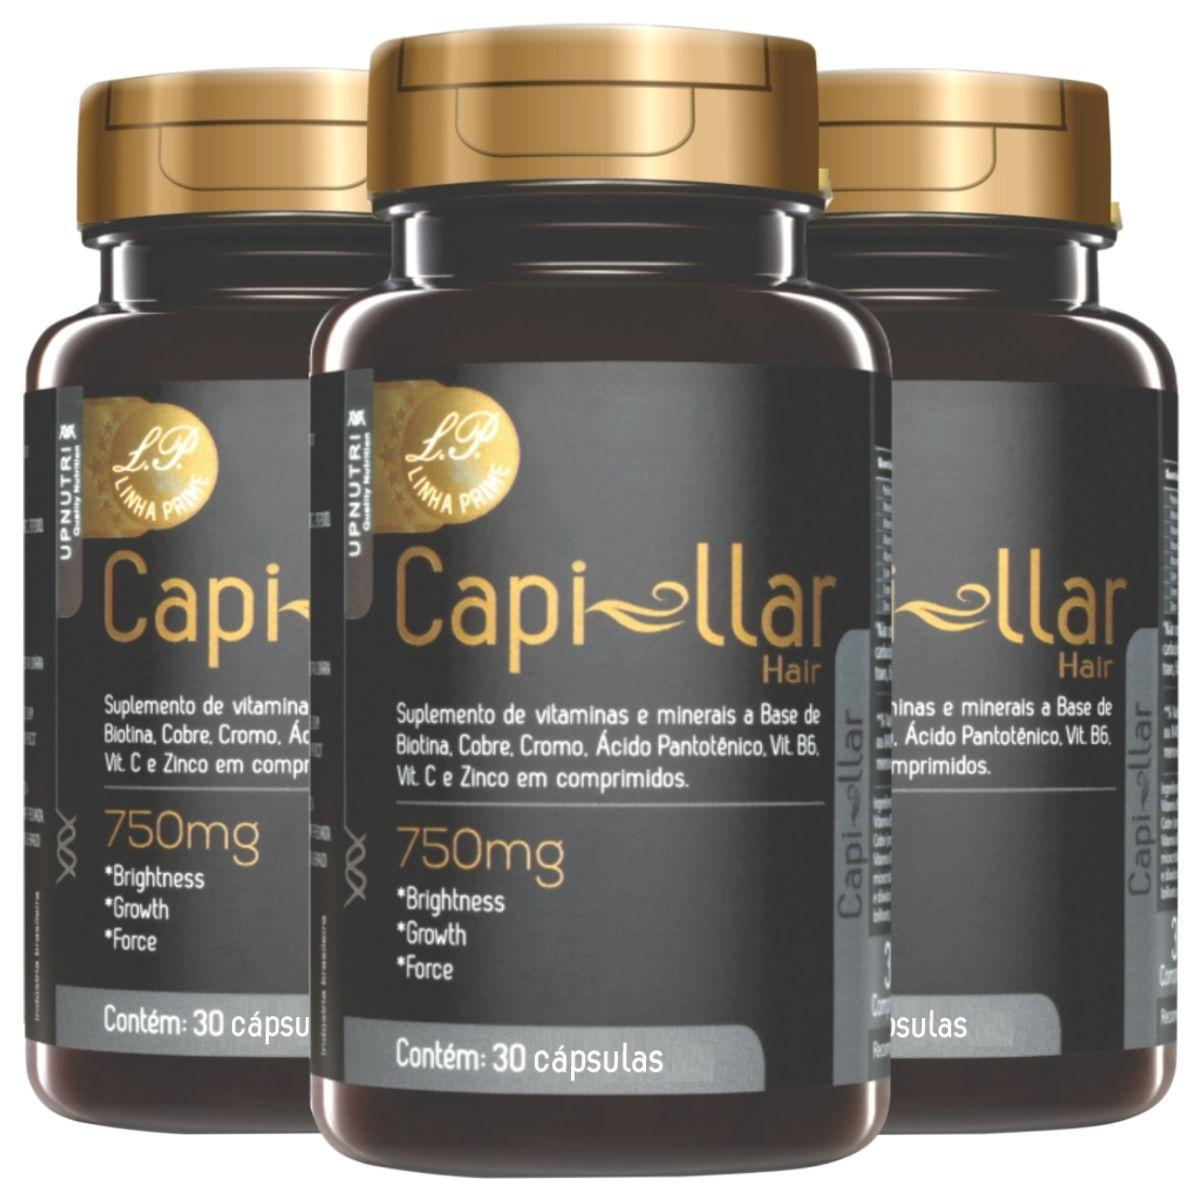 Kit 3 Capillar Hair Prime 30 Cápsulas 500mg Upnutri - Crescimento Capilar